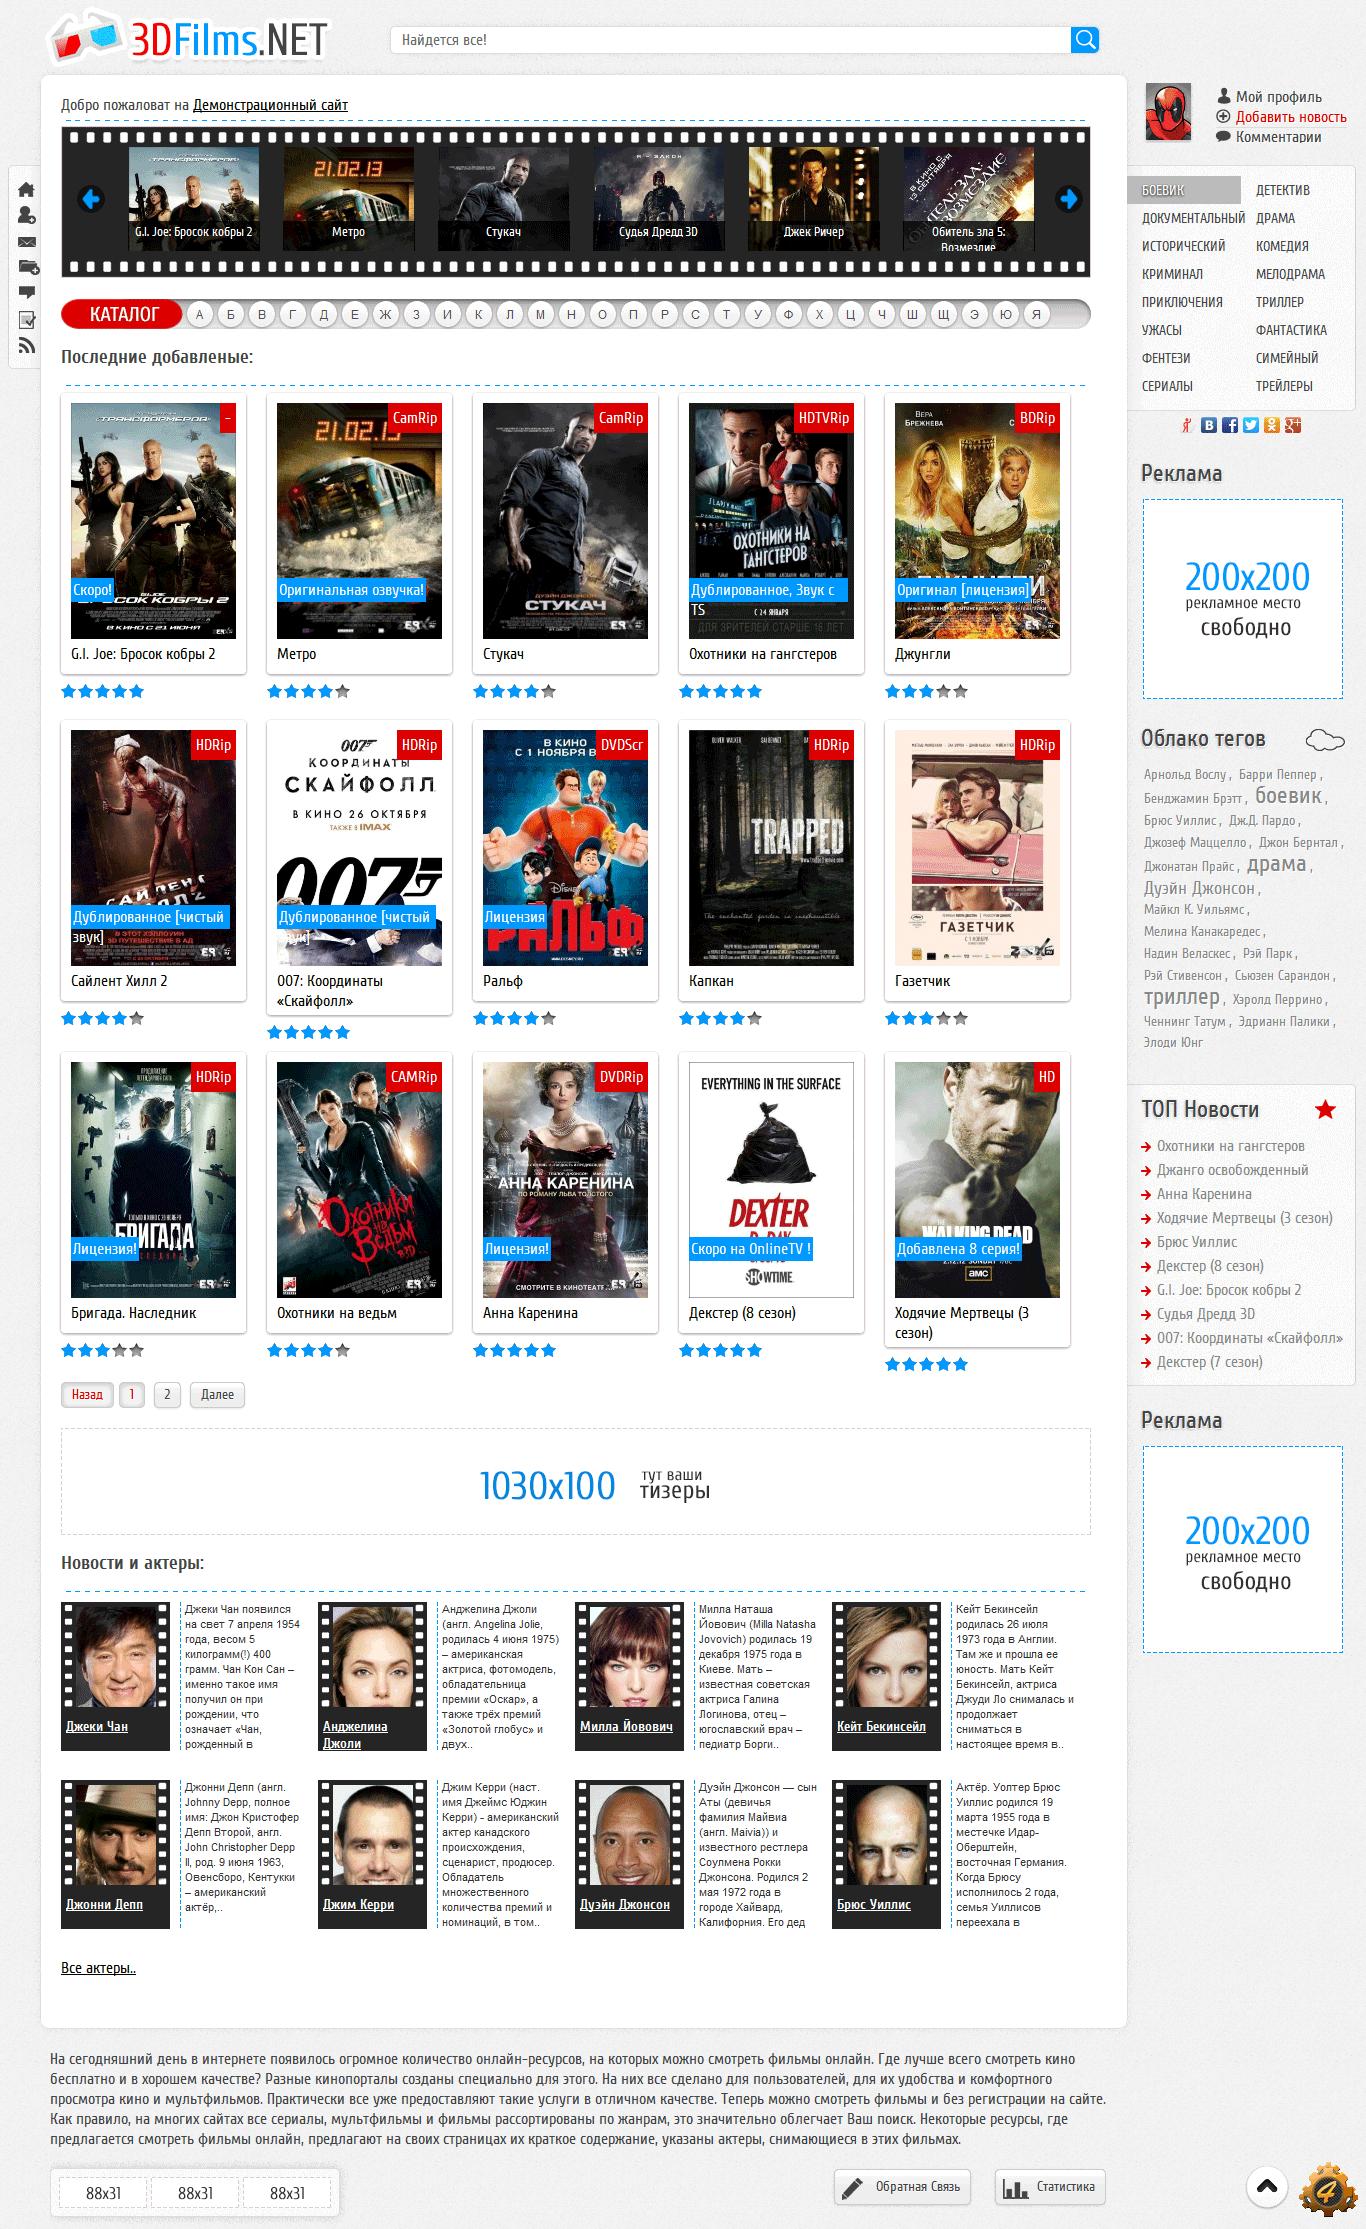 Сайты для создания фильмов о себе сайт для создания игры текст